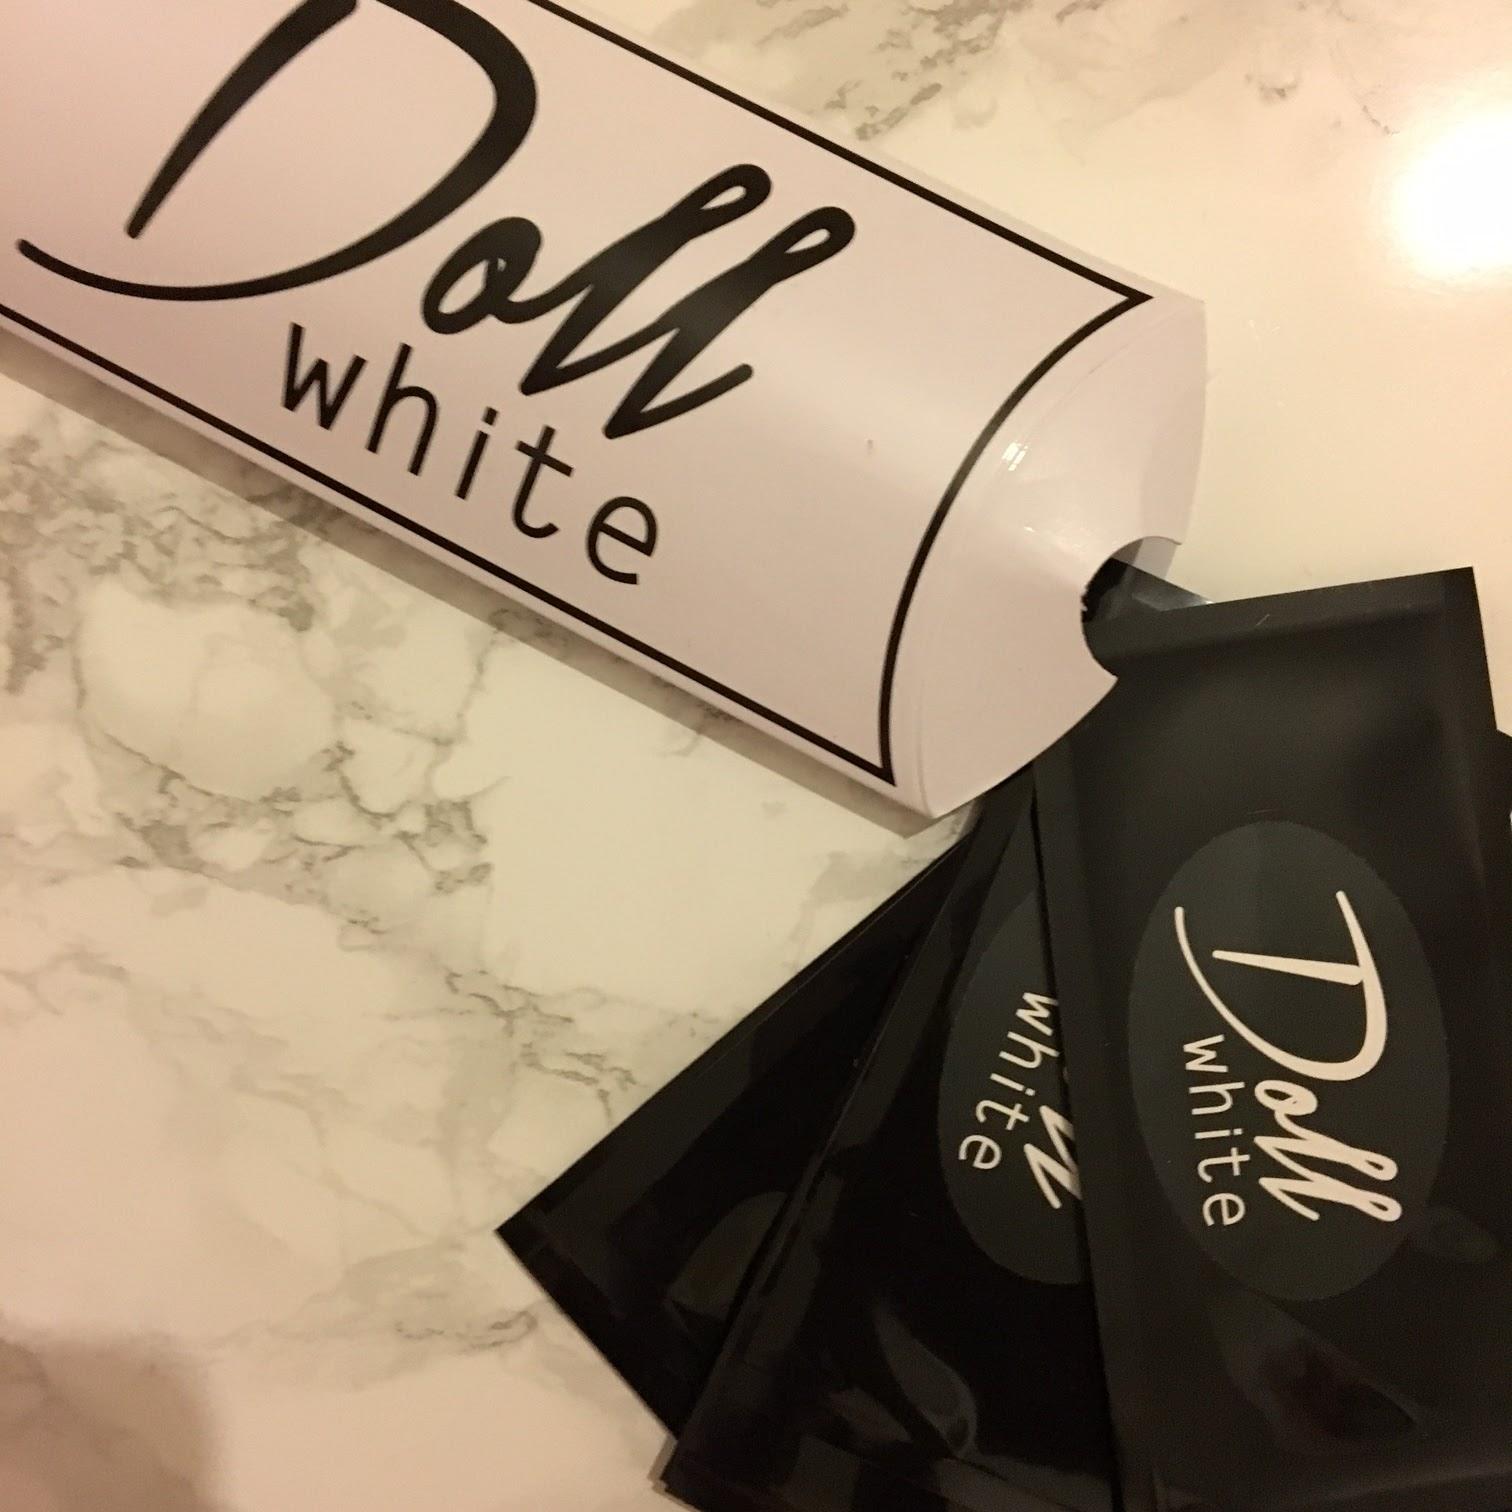 Doll White Teeth - Non Peroxide Teeth Whitening Solution